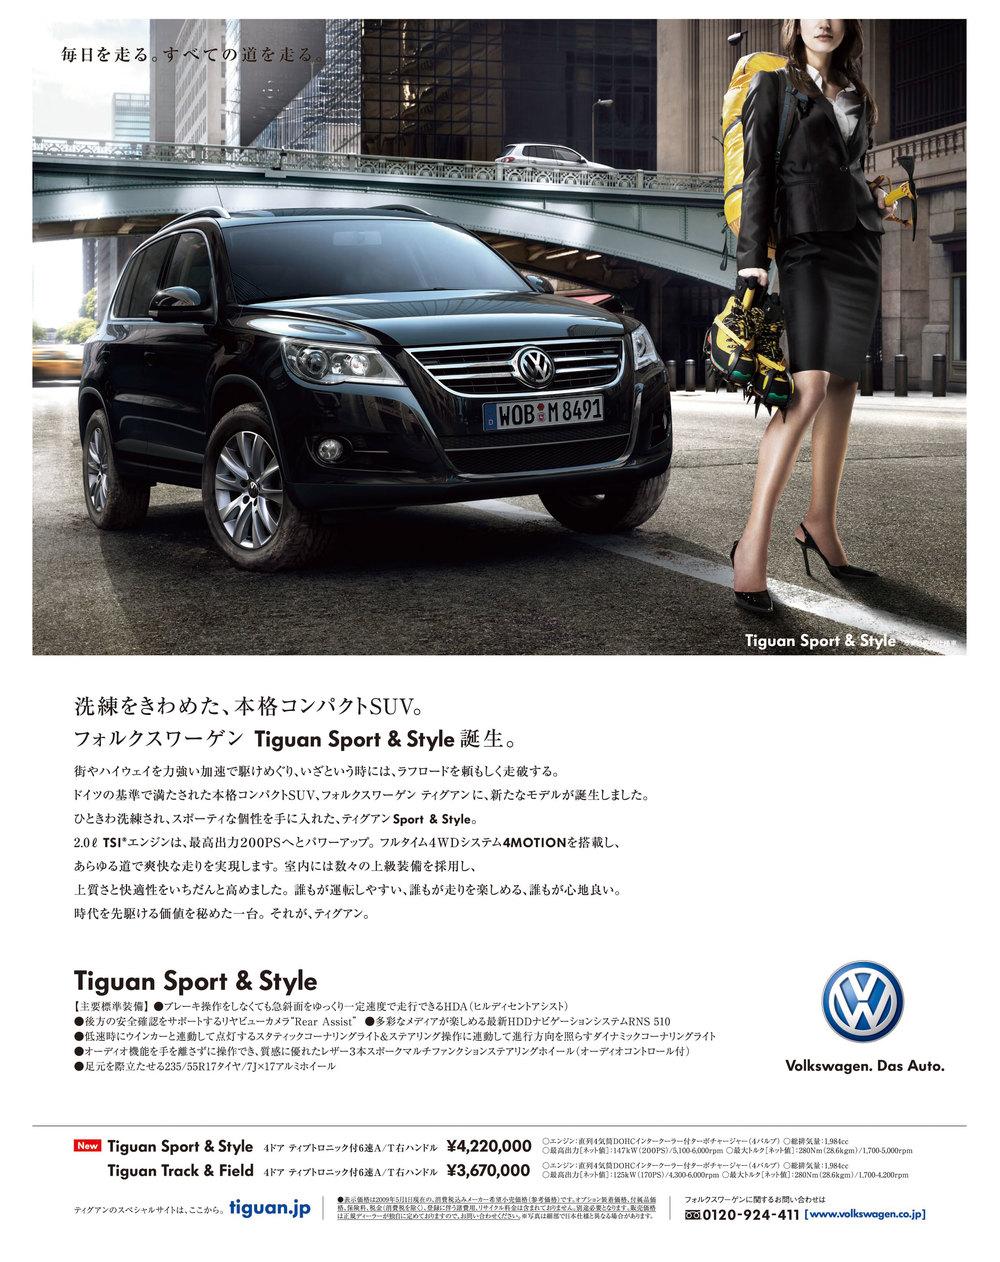 VW_TiguanS&S_MG4c.jpg